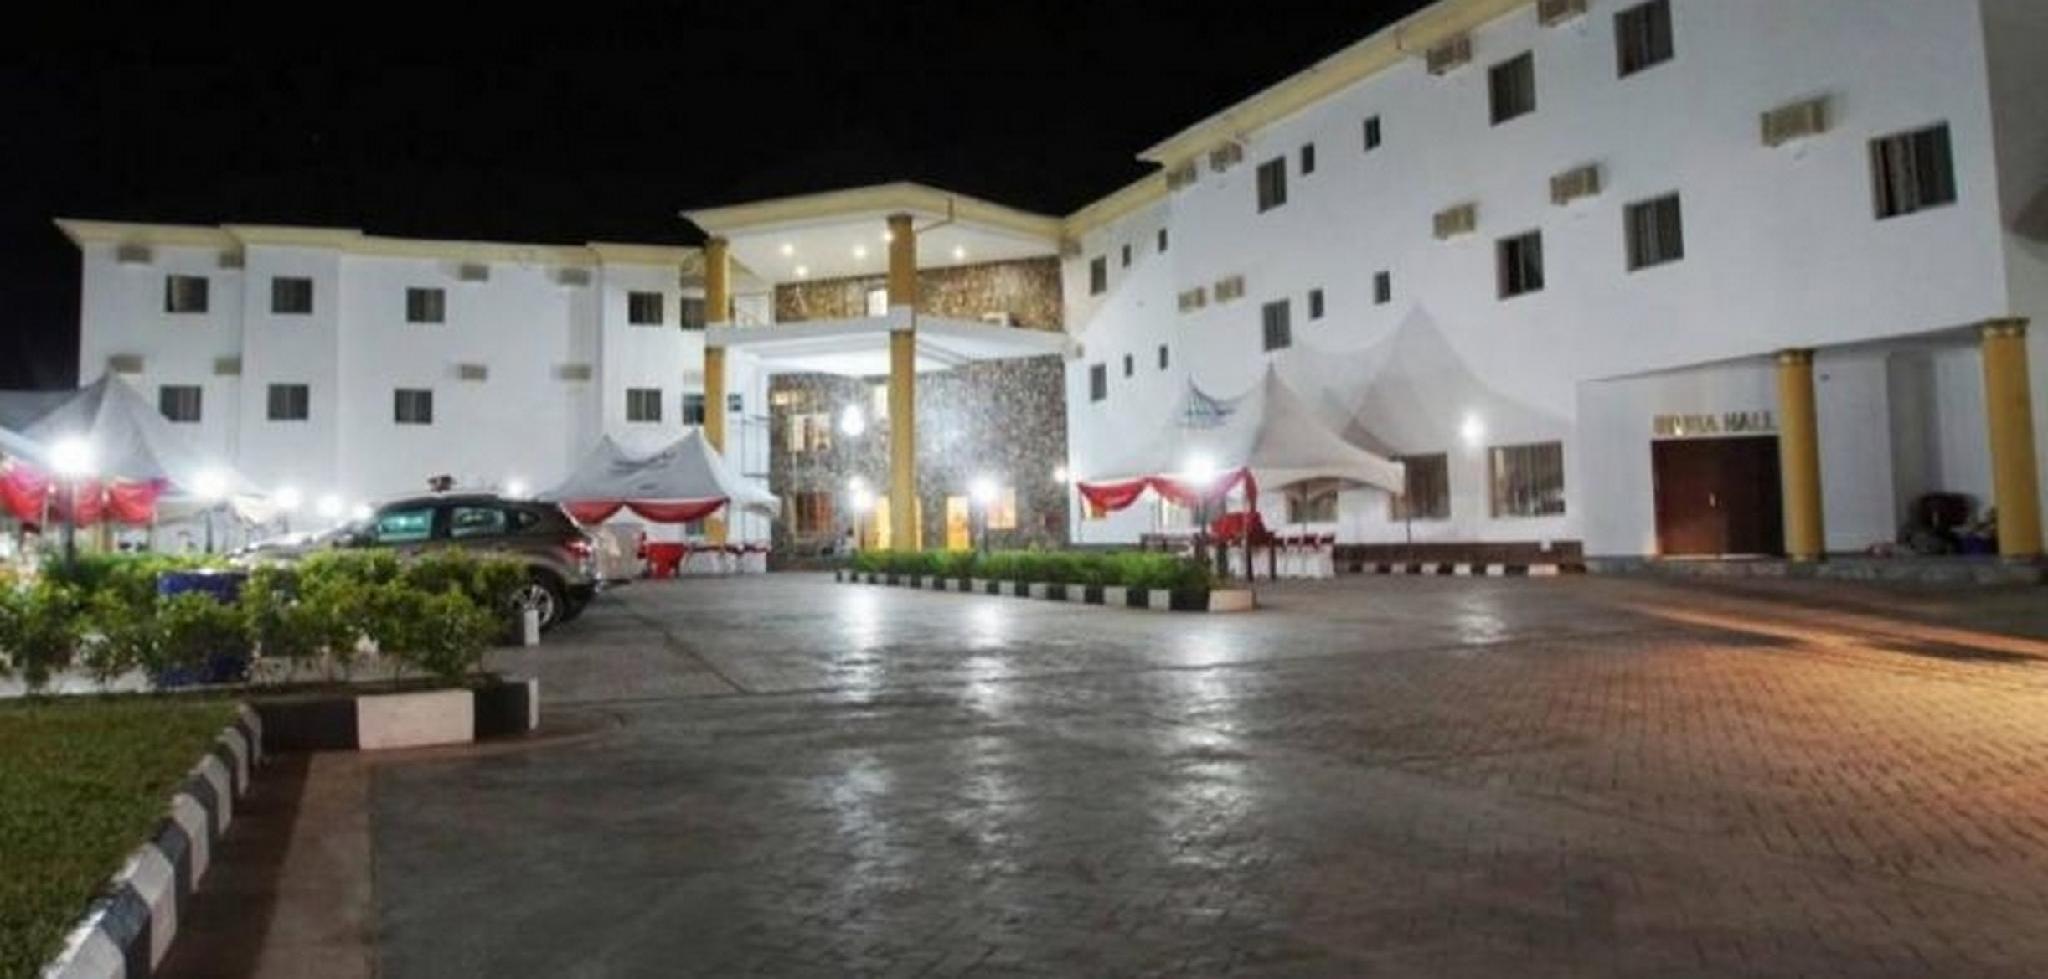 Ebiis Hotel